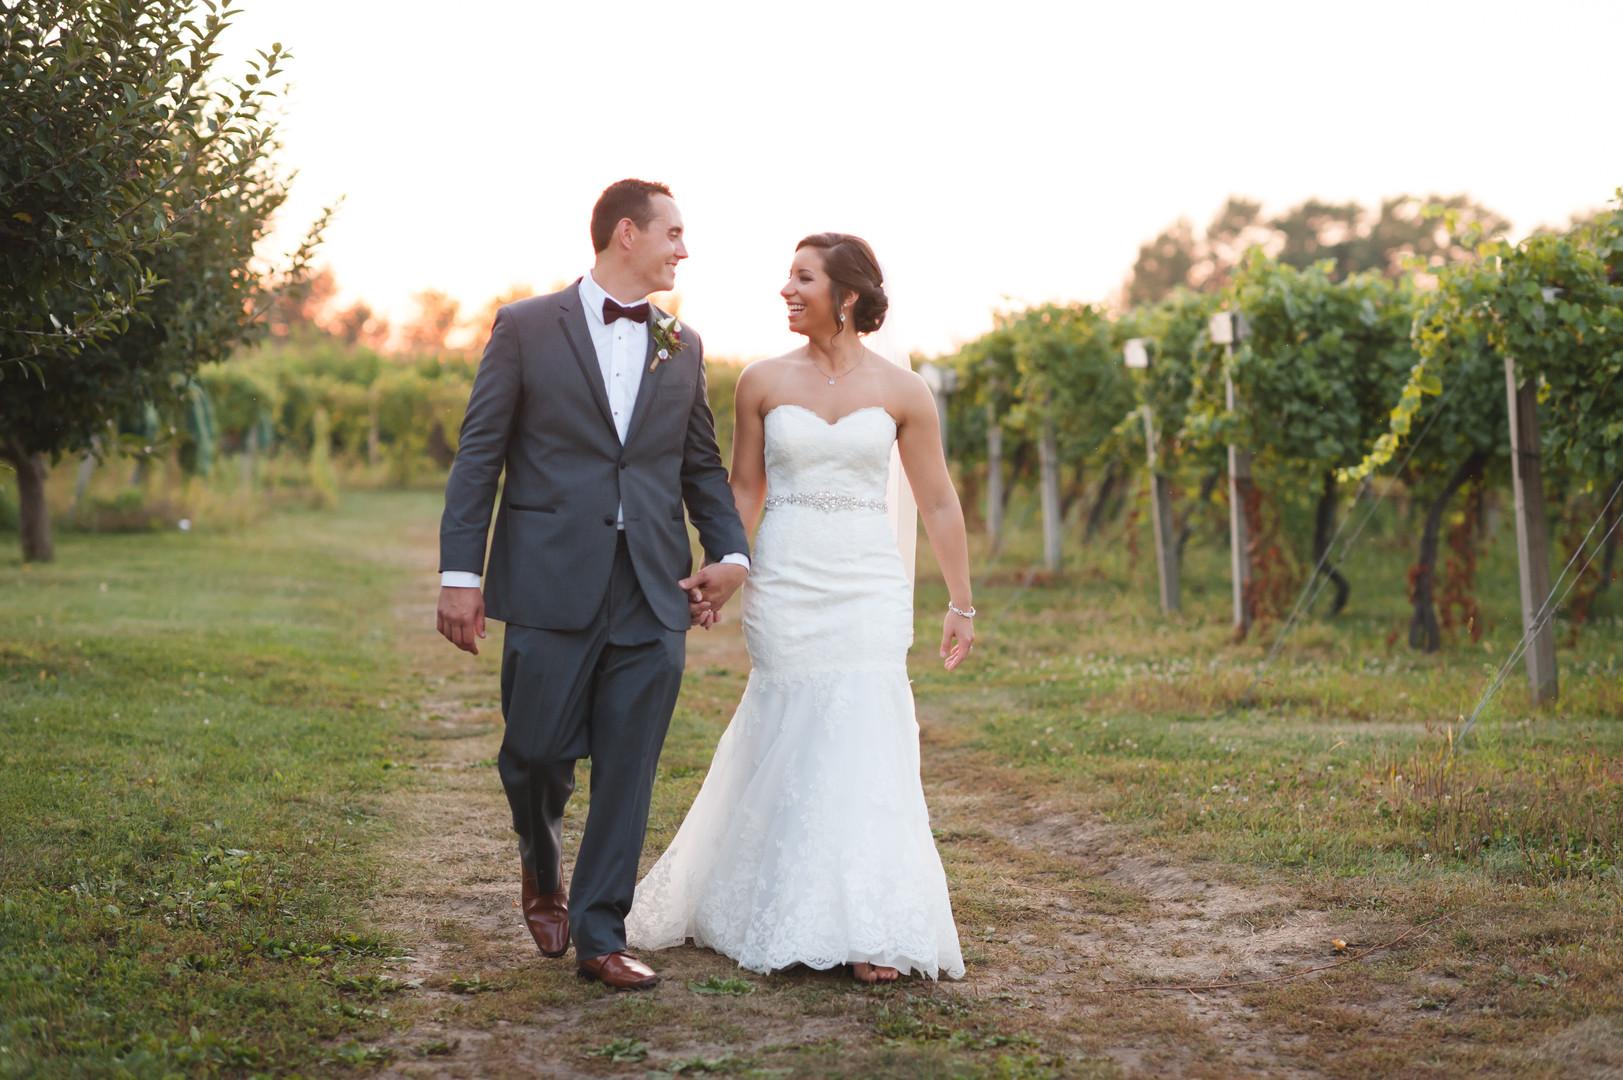 Sunset Bride and Groom Portrait Chicago Winery Wedding Elite Photo